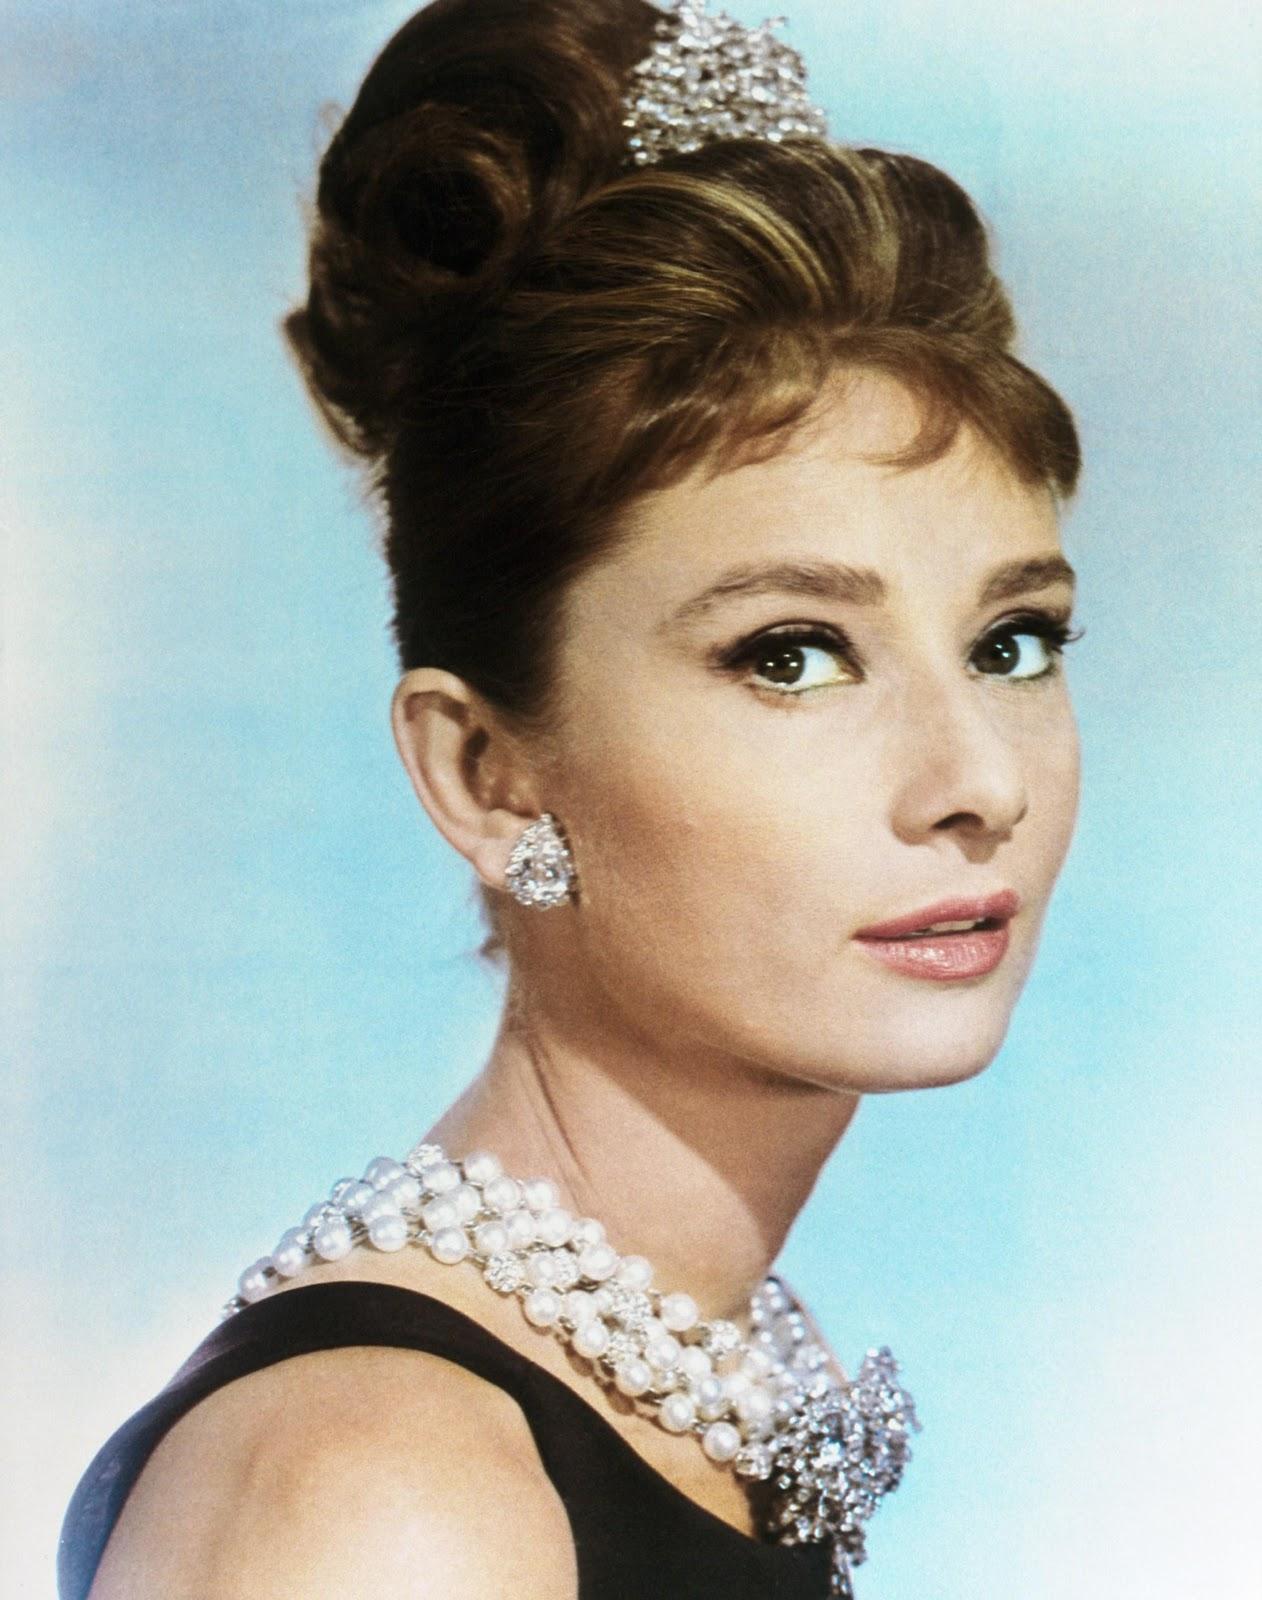 Breakfast At Tiffanys Audrey Hepburn 1960s Makeup